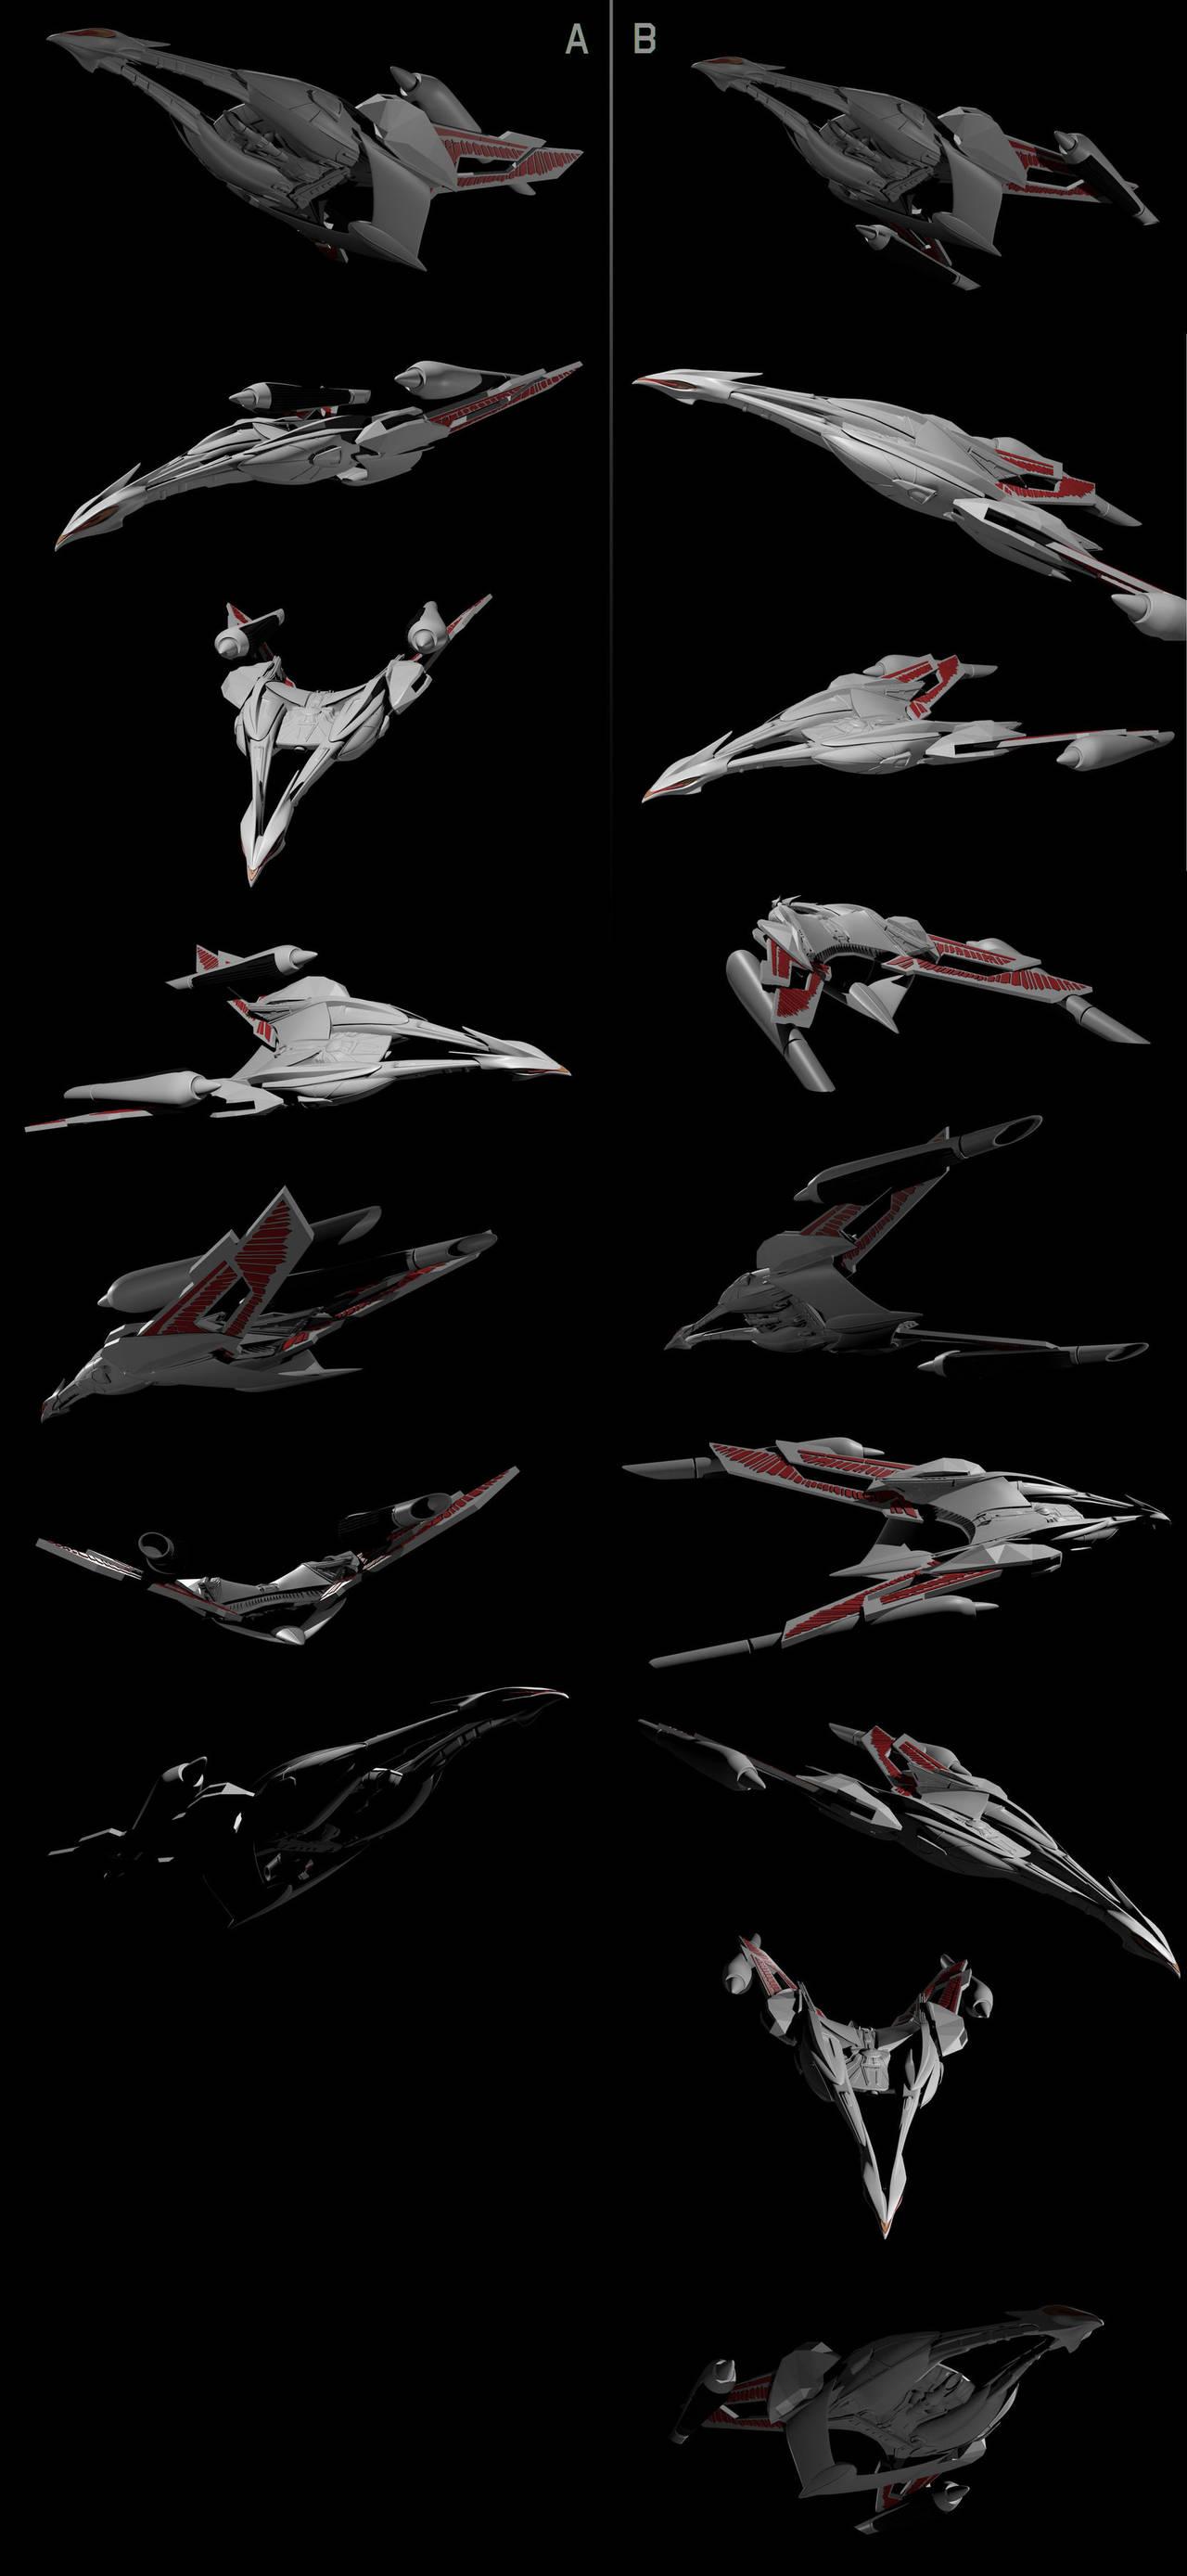 romulan_bird_of_prey_wip_08_by_jrxtin_dcv49ac-fullview.jpg